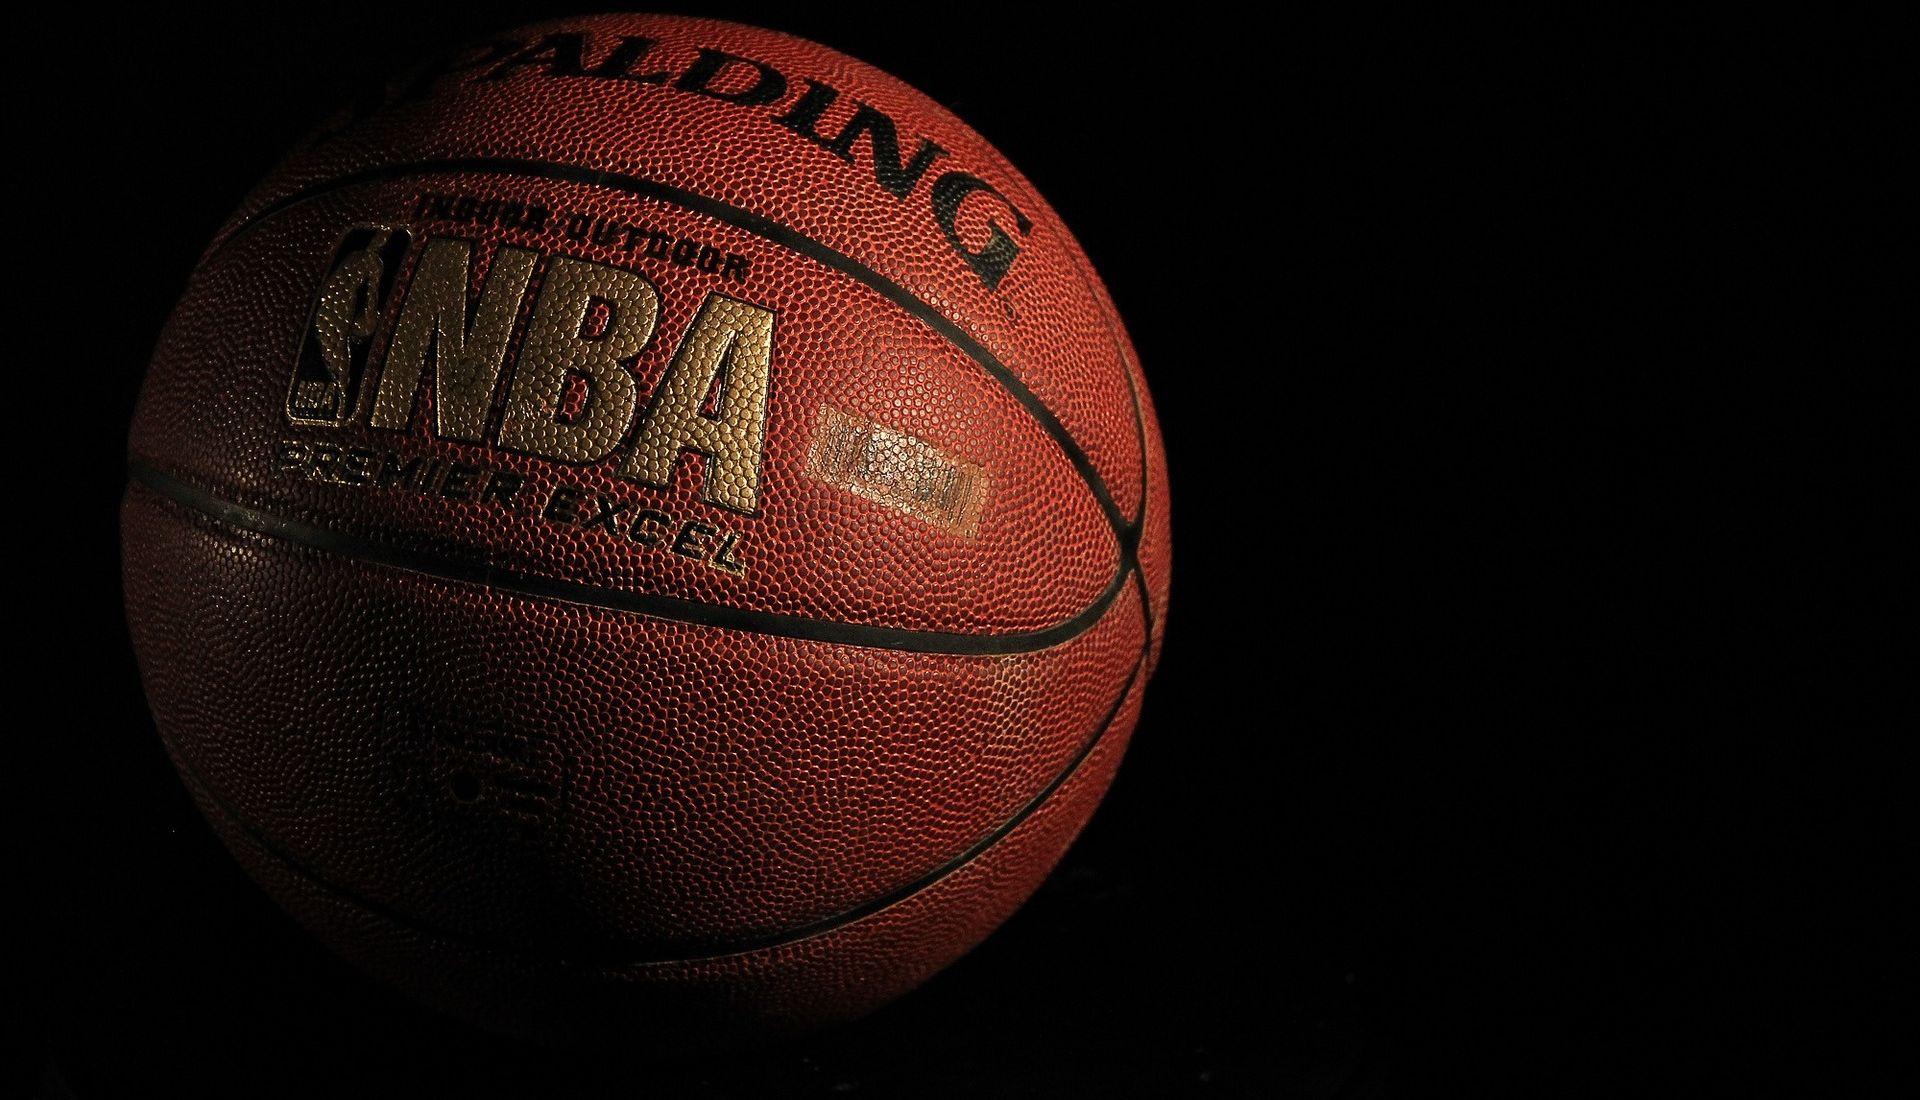 NBA Cleveland ispustili veliku prednost, ali ipak slavili